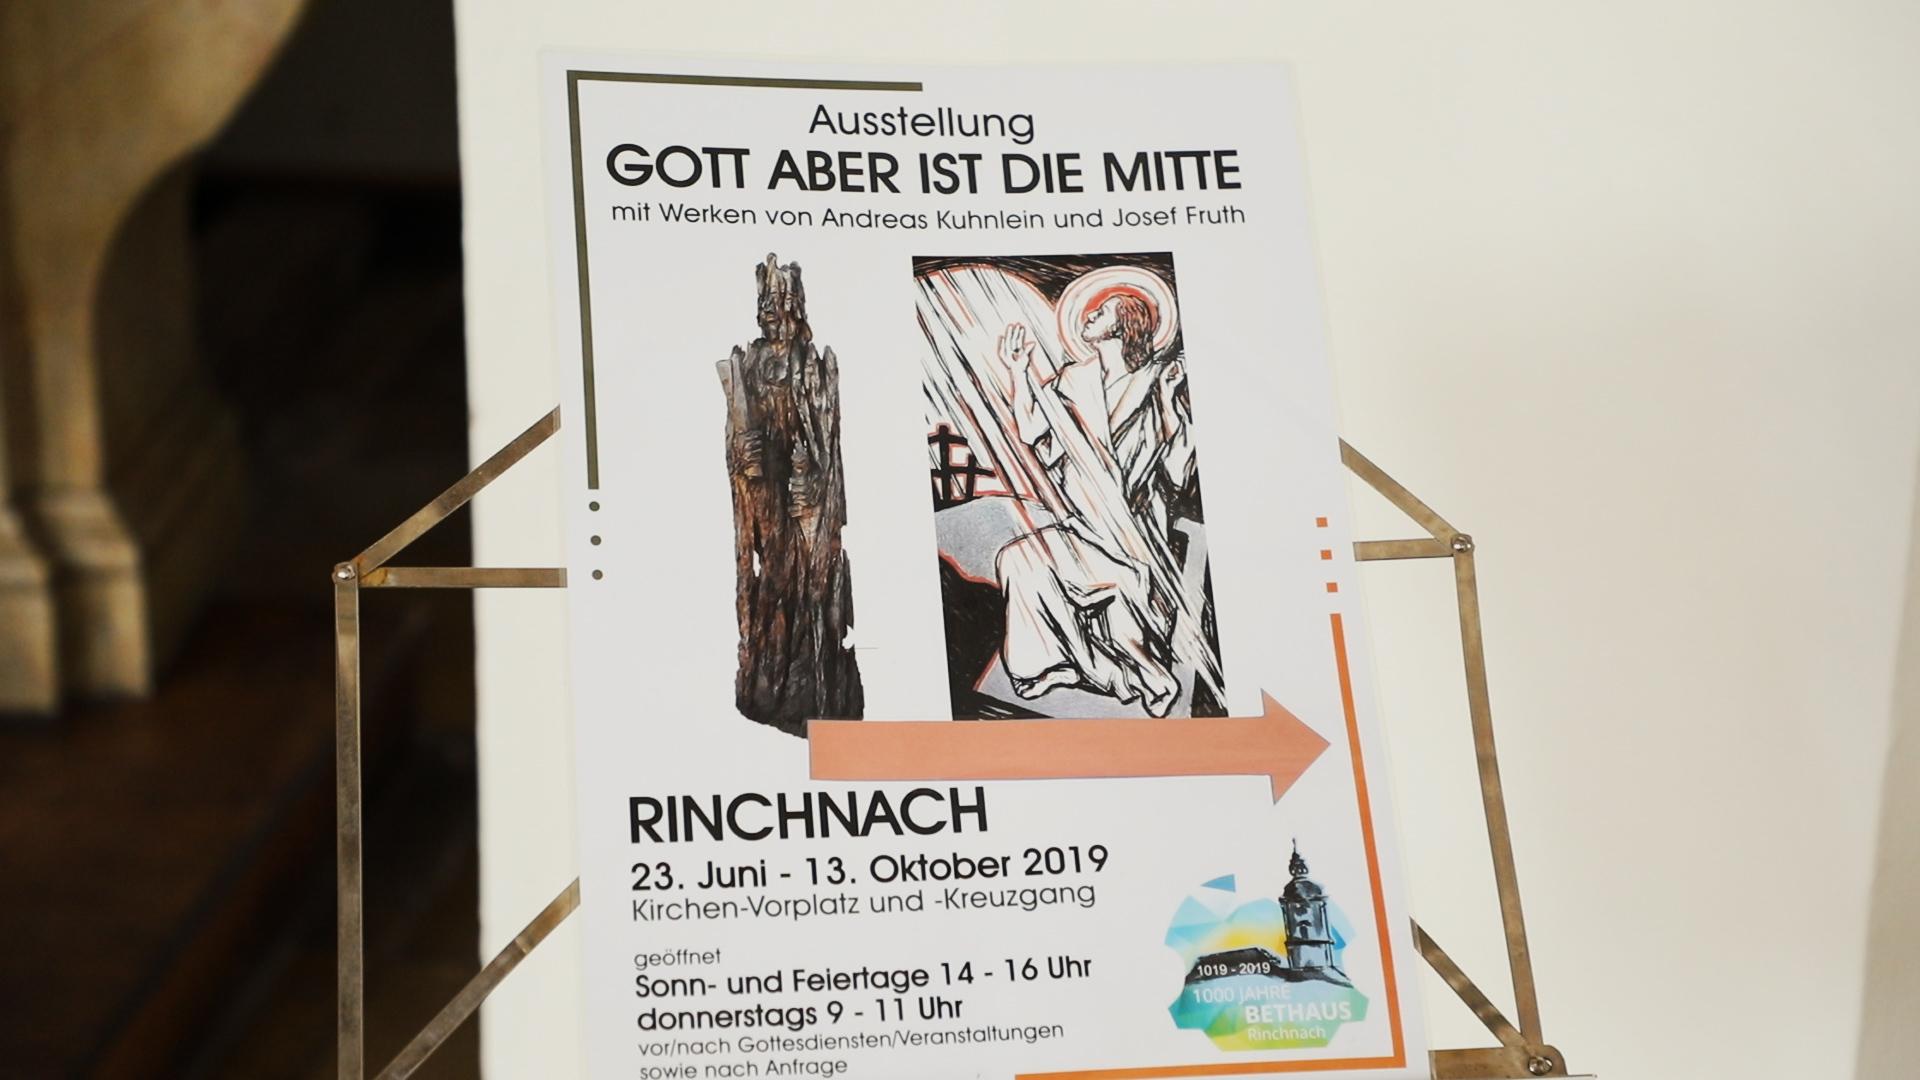 190808_1000-Jahre-Rinchnach_Ausstellung_thumb1